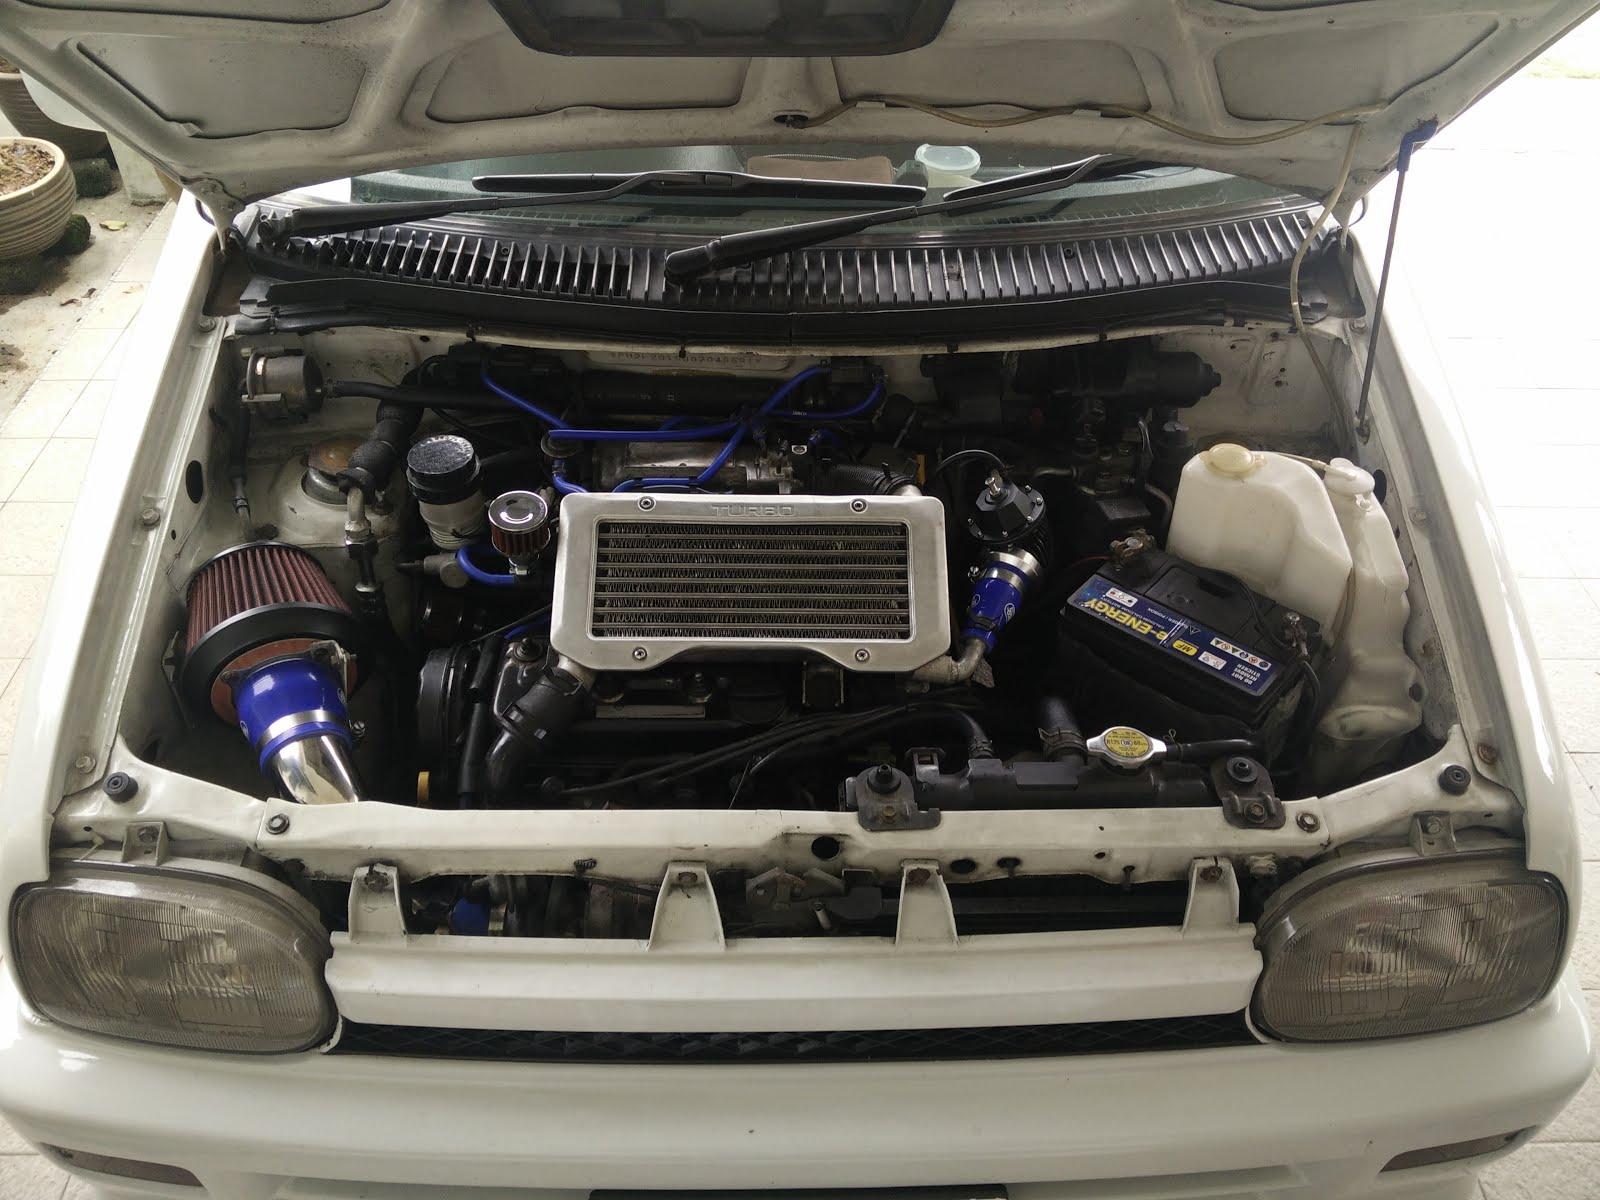 The First Little Car April 2016 Daihatsu Mira L200s Wiring Diagram Dulu Ada Buat Utk Pasang Ni Lupa Letak Kat Mana